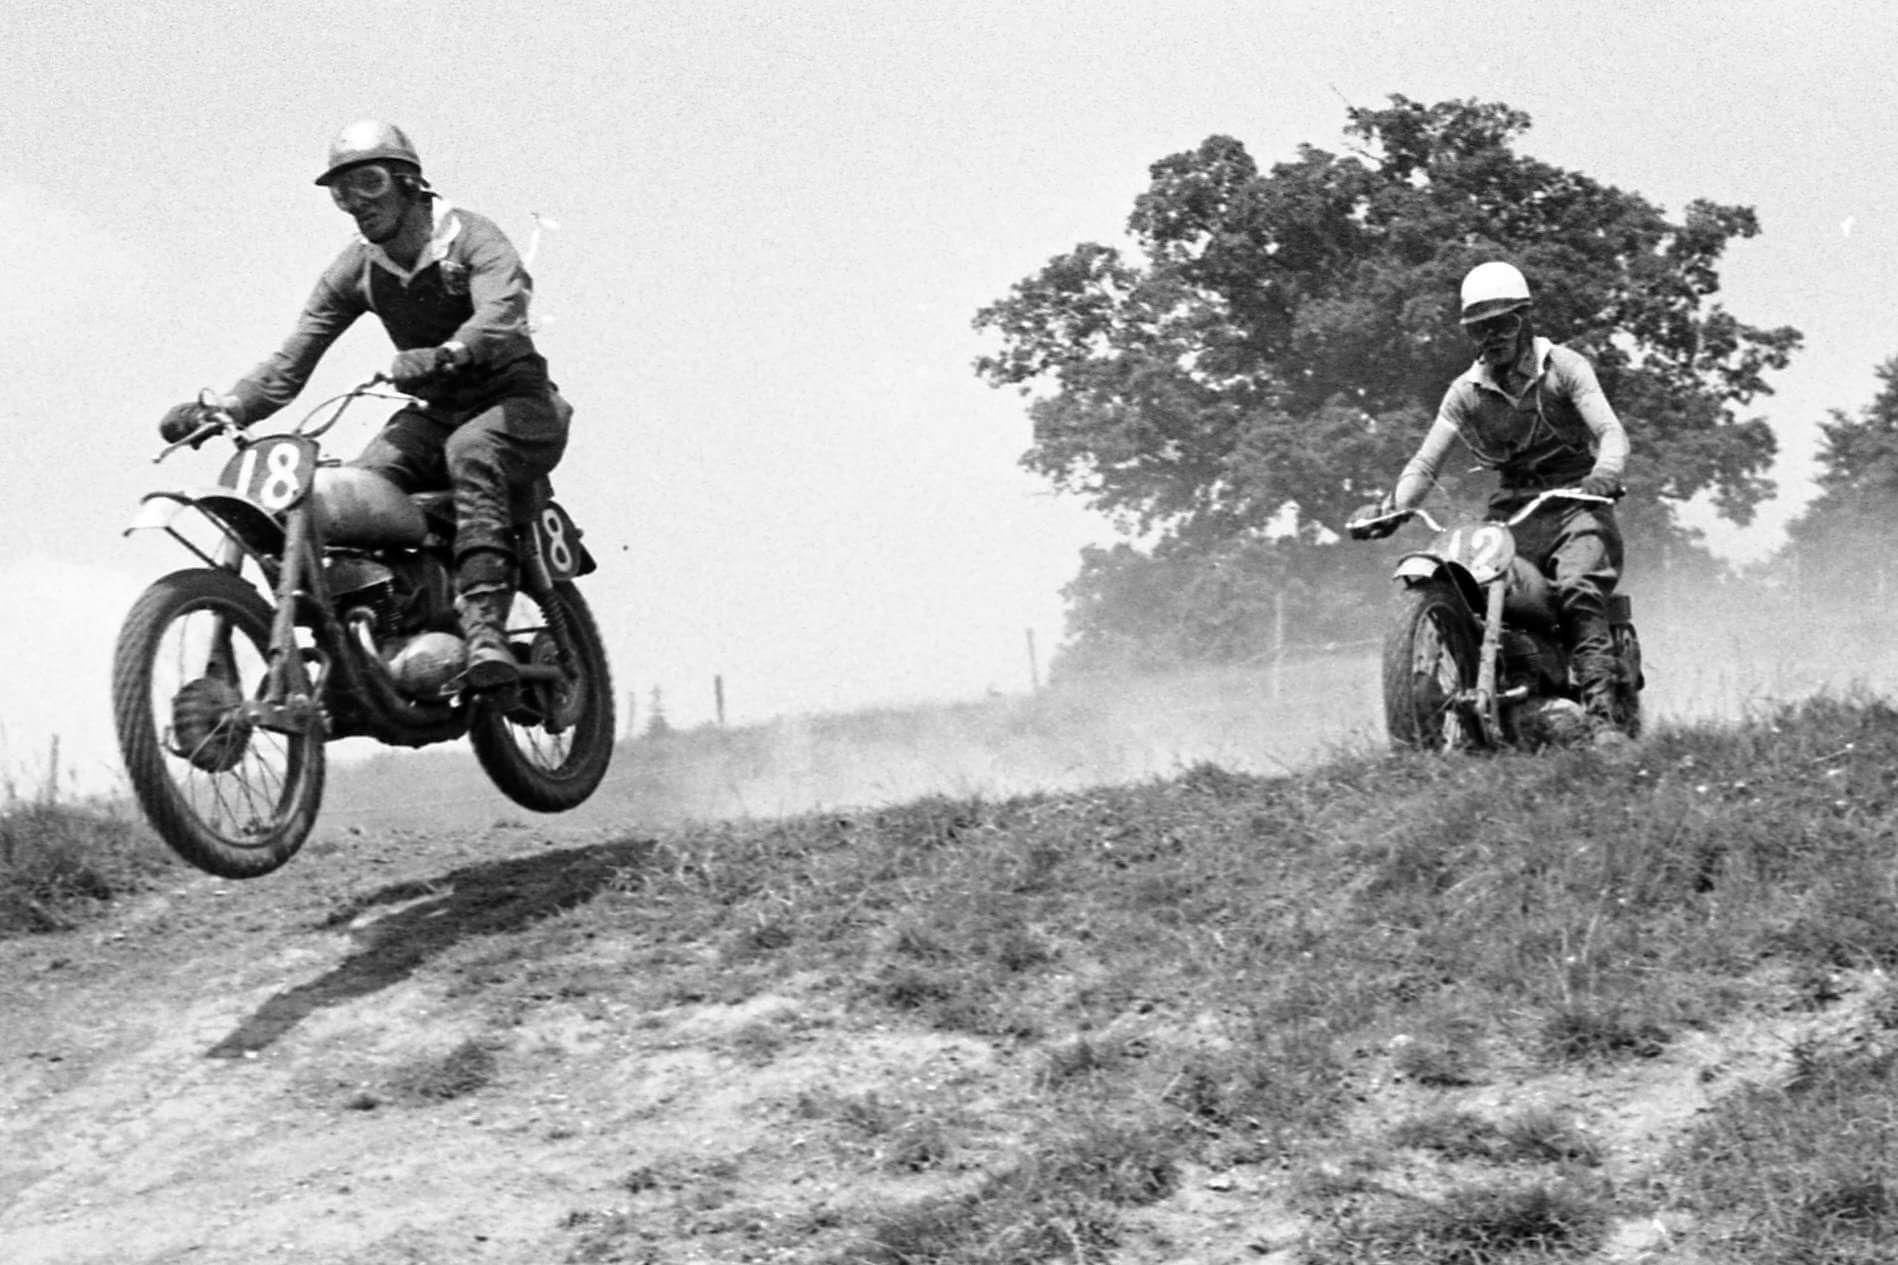 Brian Stonebridge And Dave Bickers Beenham Park 1958